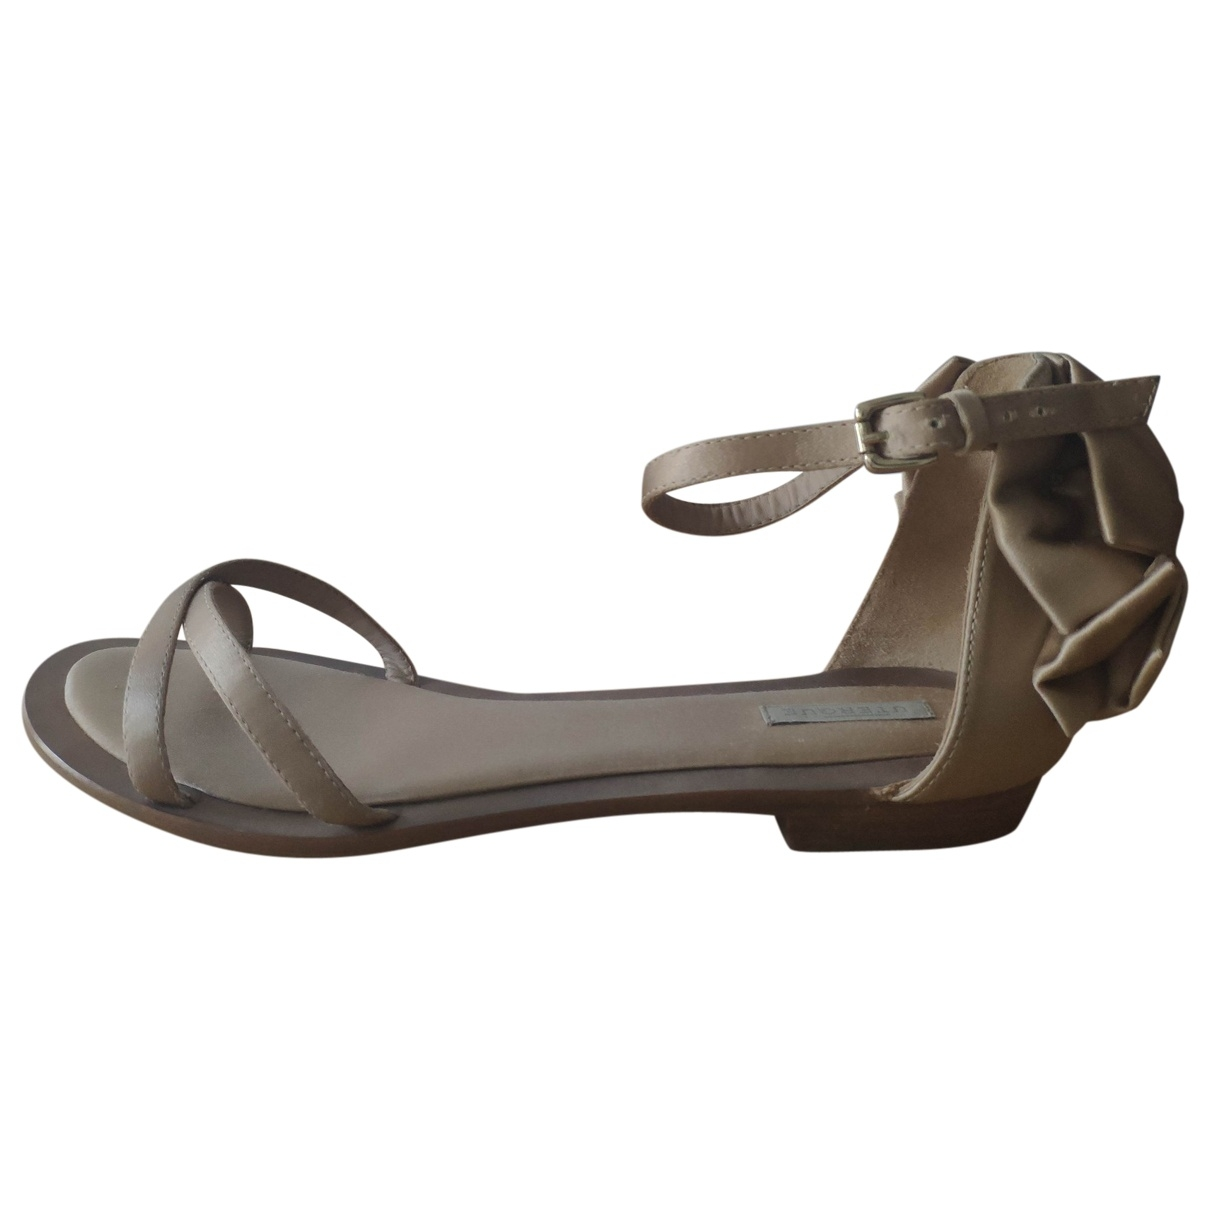 Sandalias de Lona Uterque